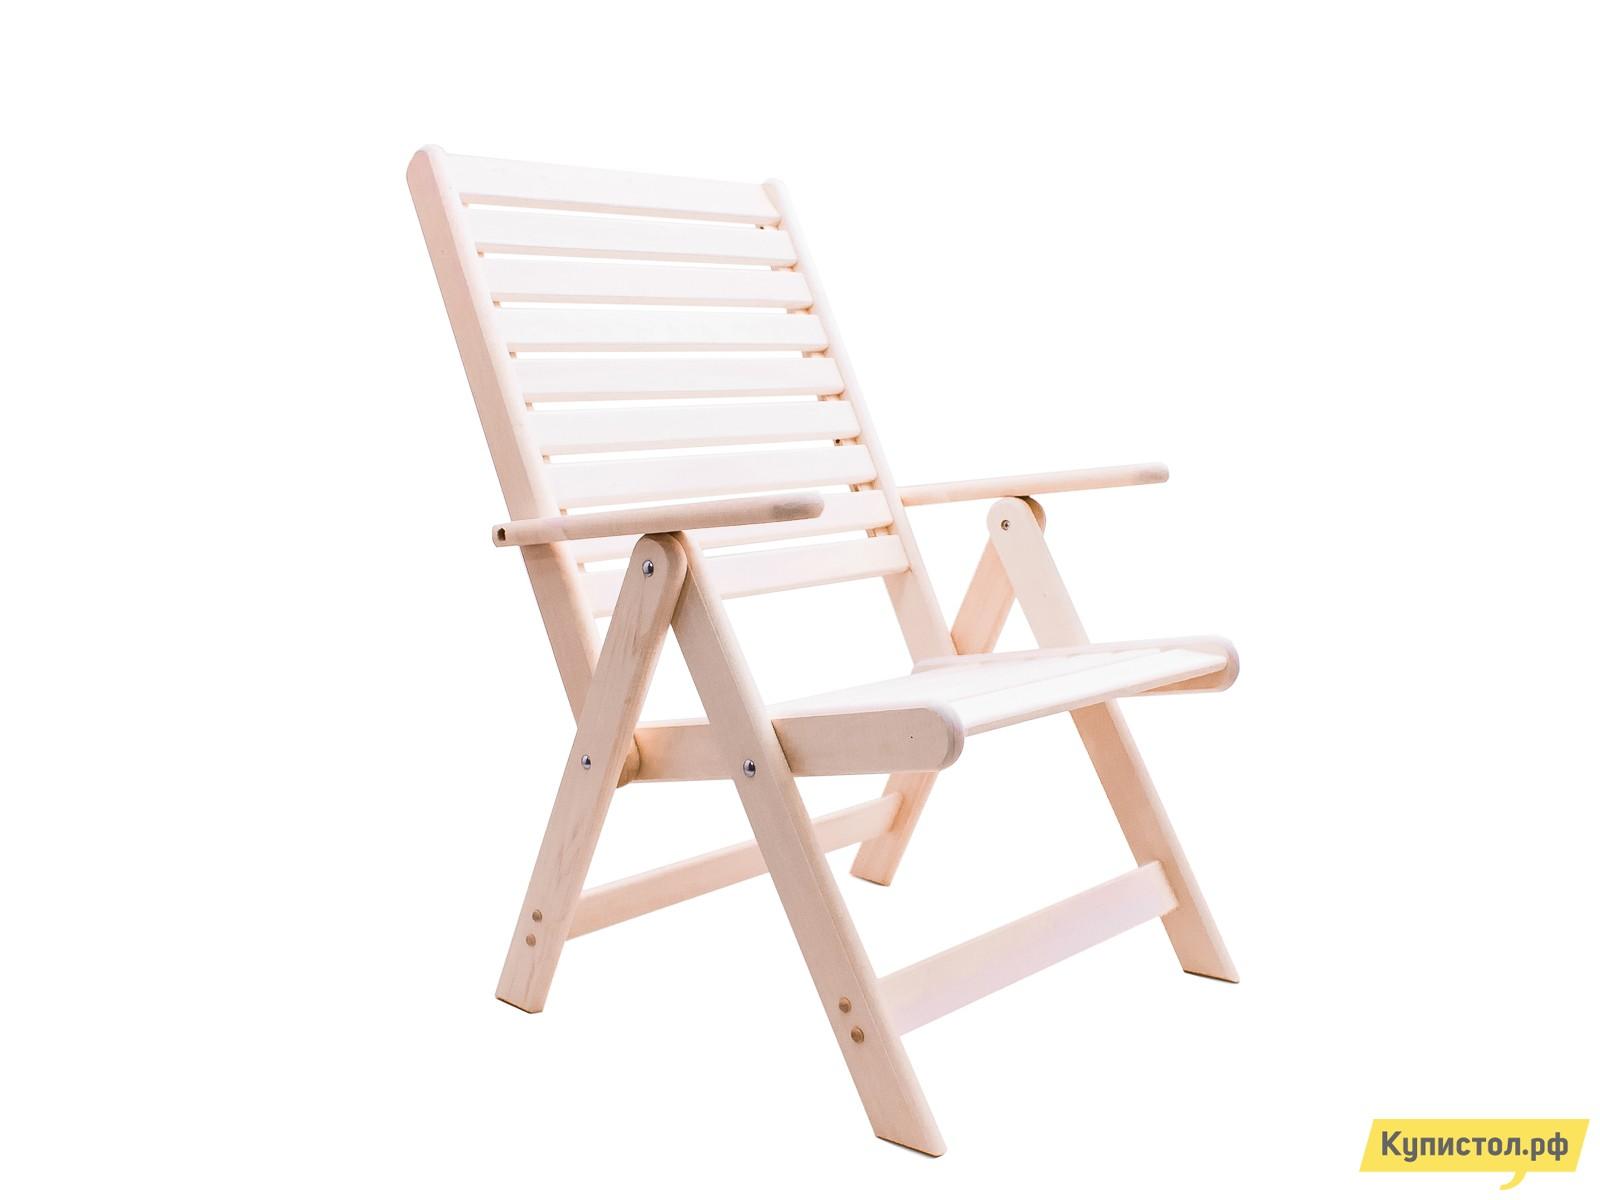 Садовое кресло ММ Ганро Липа